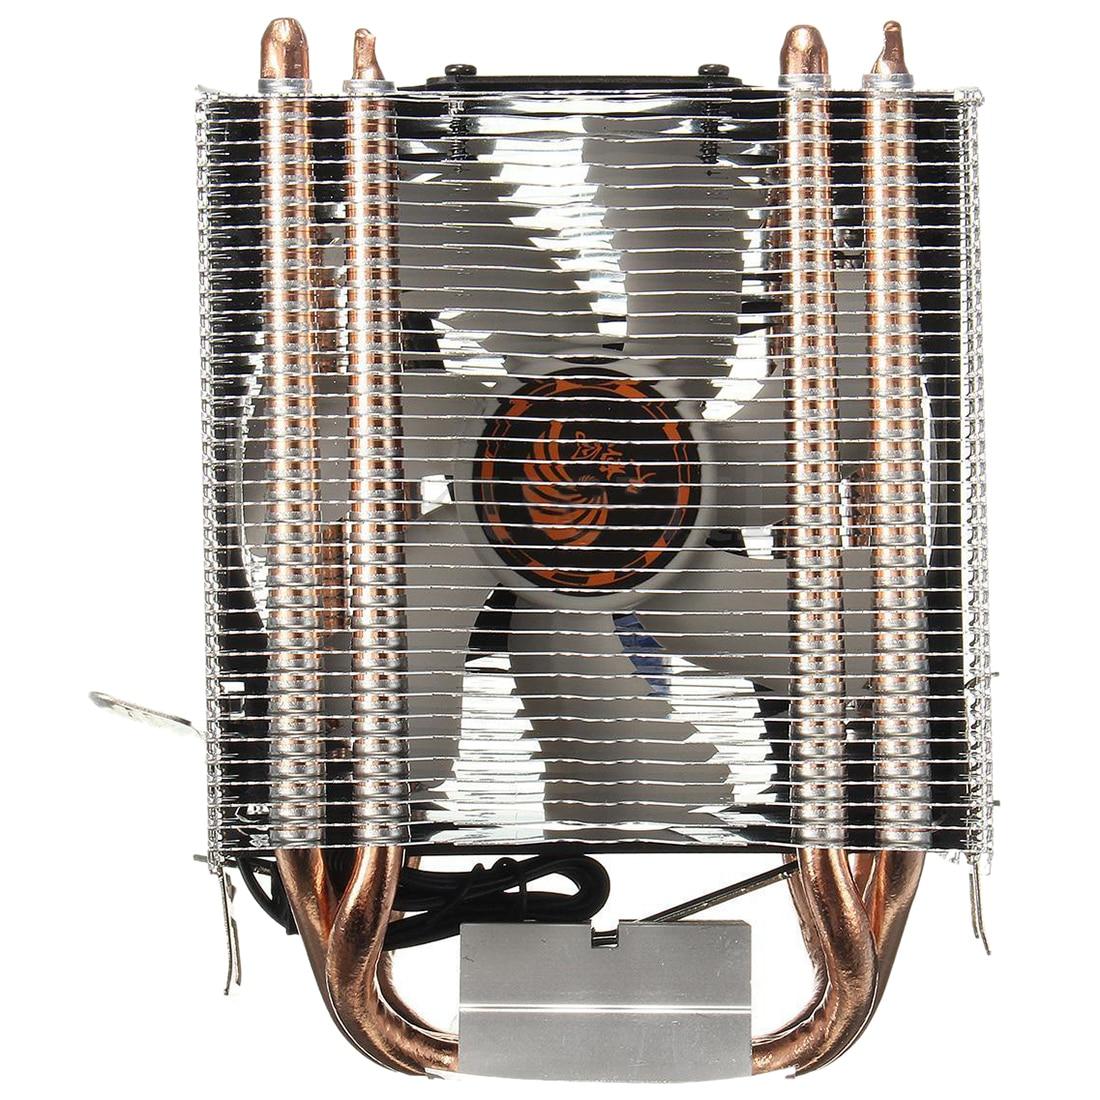 все цены на 4 Heatpipe CPU Cooler Heat Sink for Intel LGA 1150 1151 1155 775 1156 (FOR AMD) New